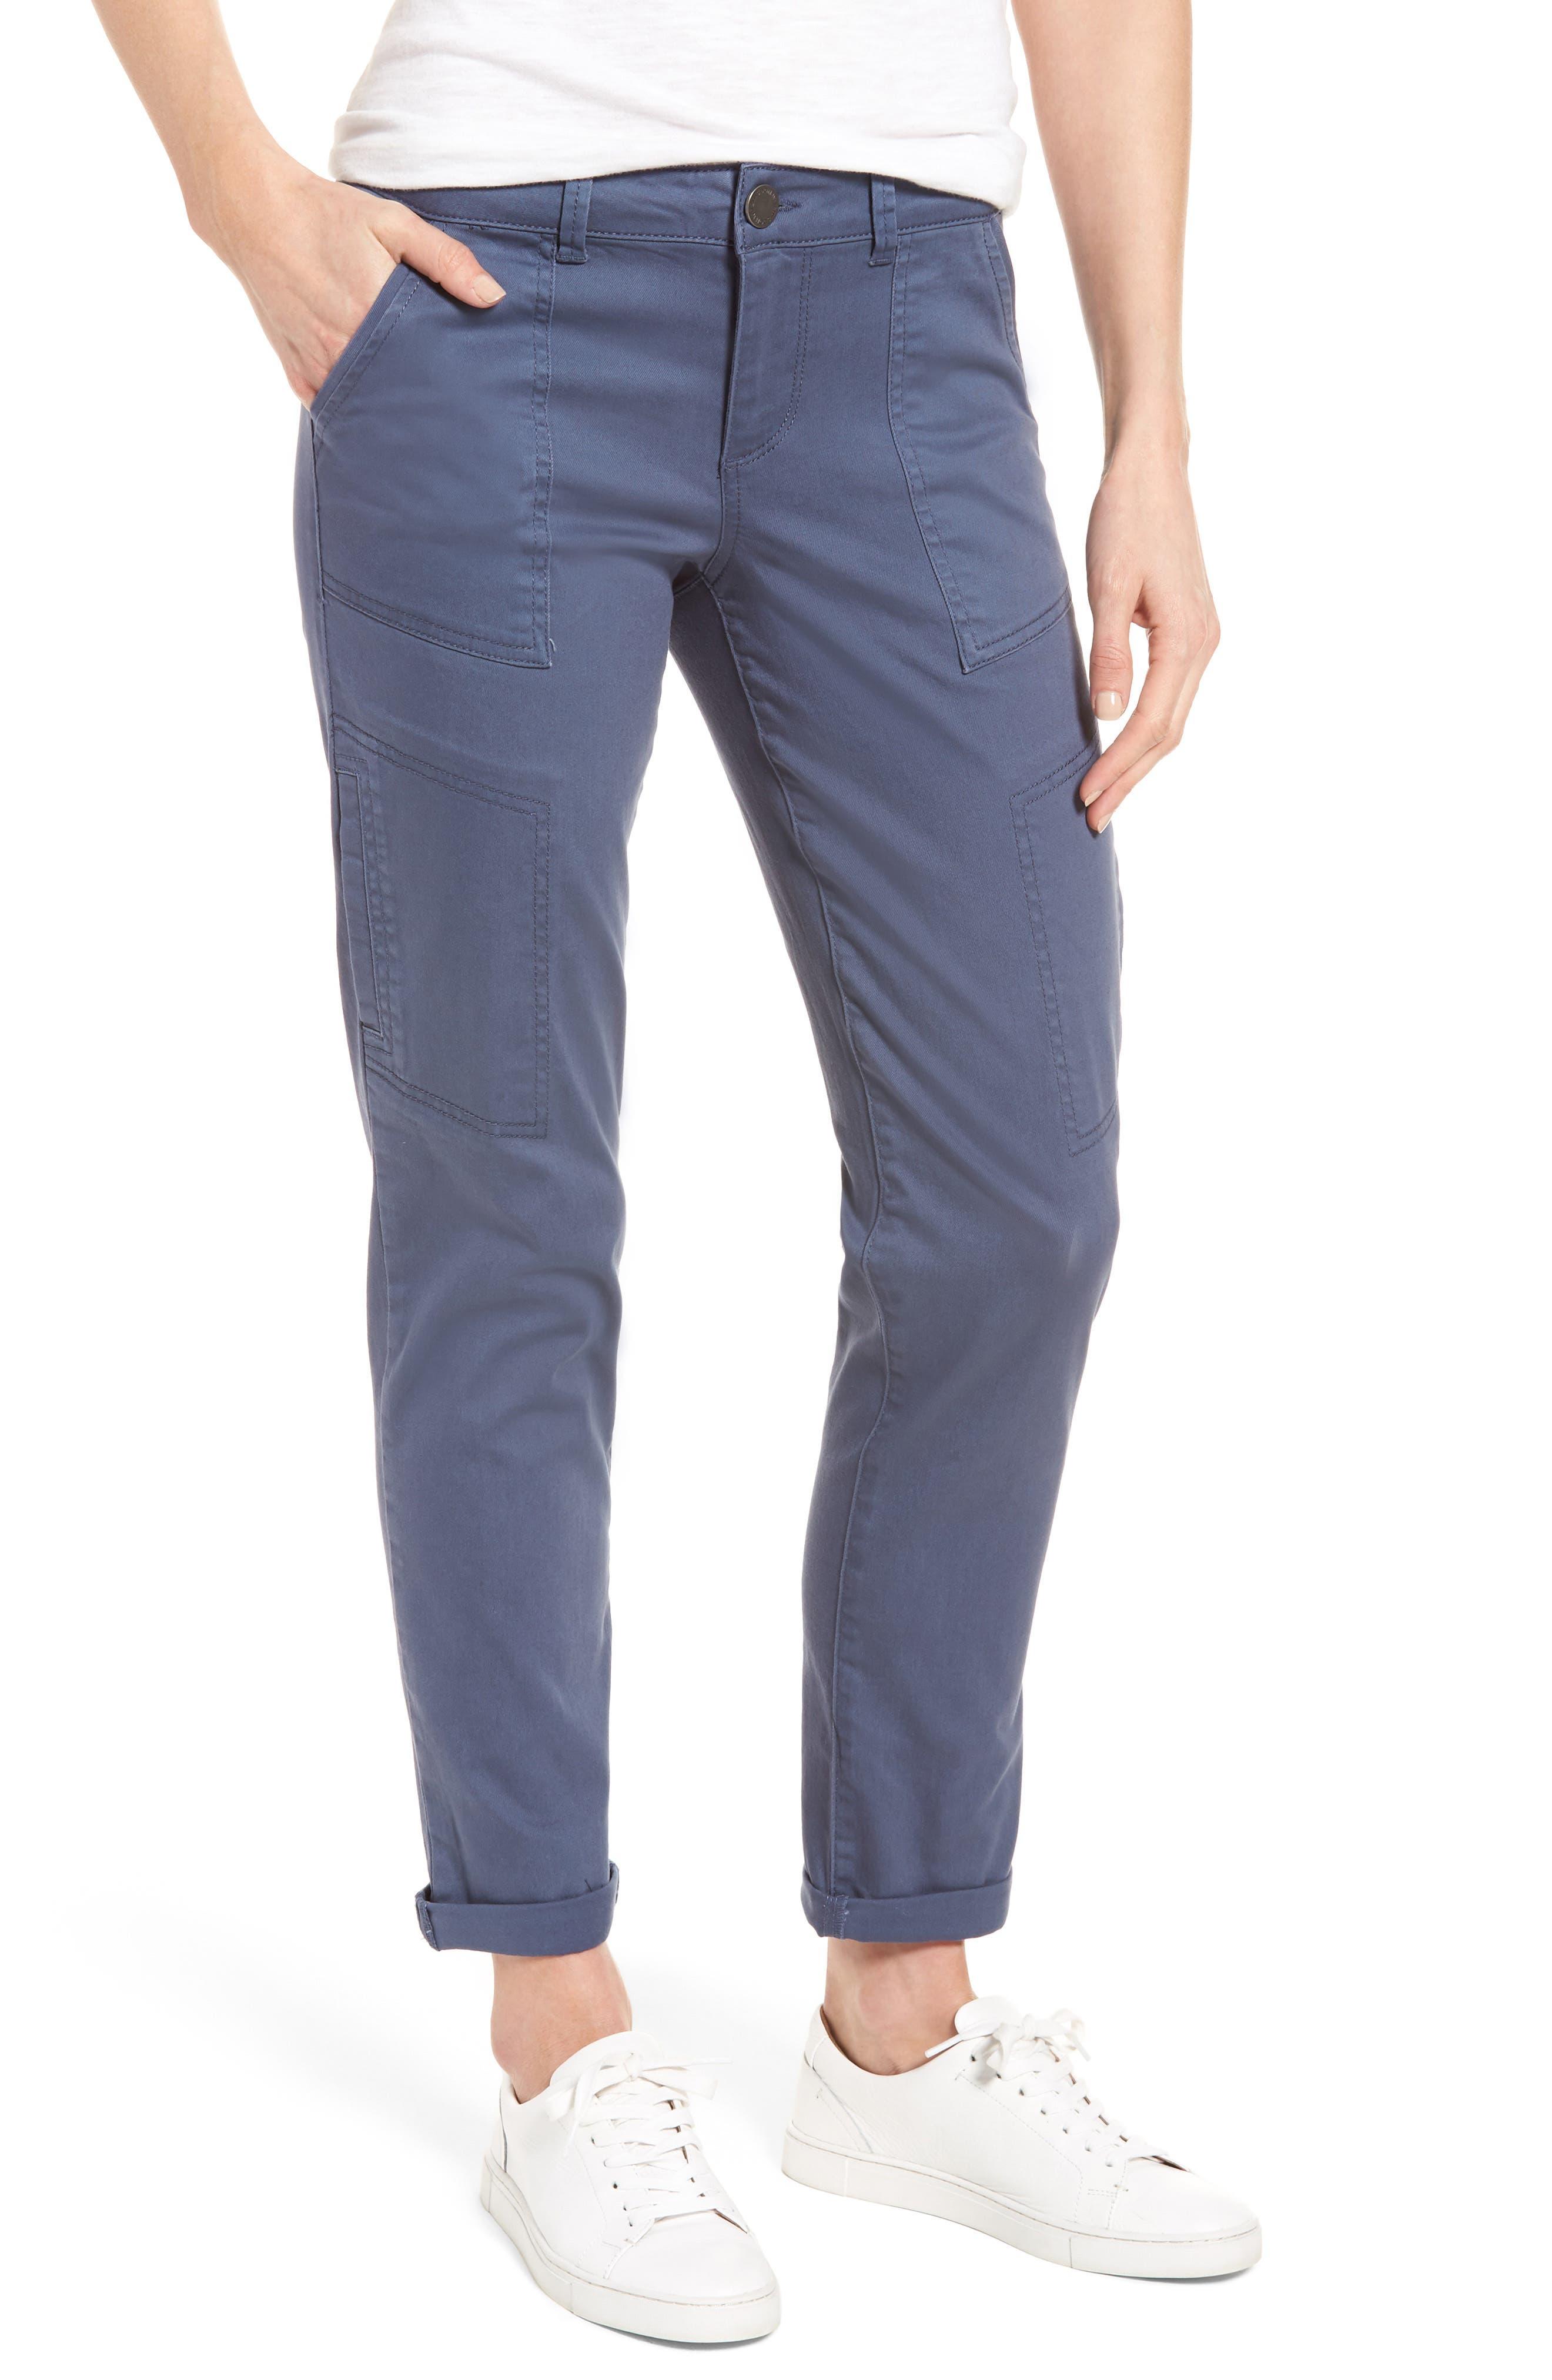 Alternate Image 1 Selected - Wit & Wisdom Skinny Cargo Pants (Regular & Petite) (Nordstrom Exclusive)